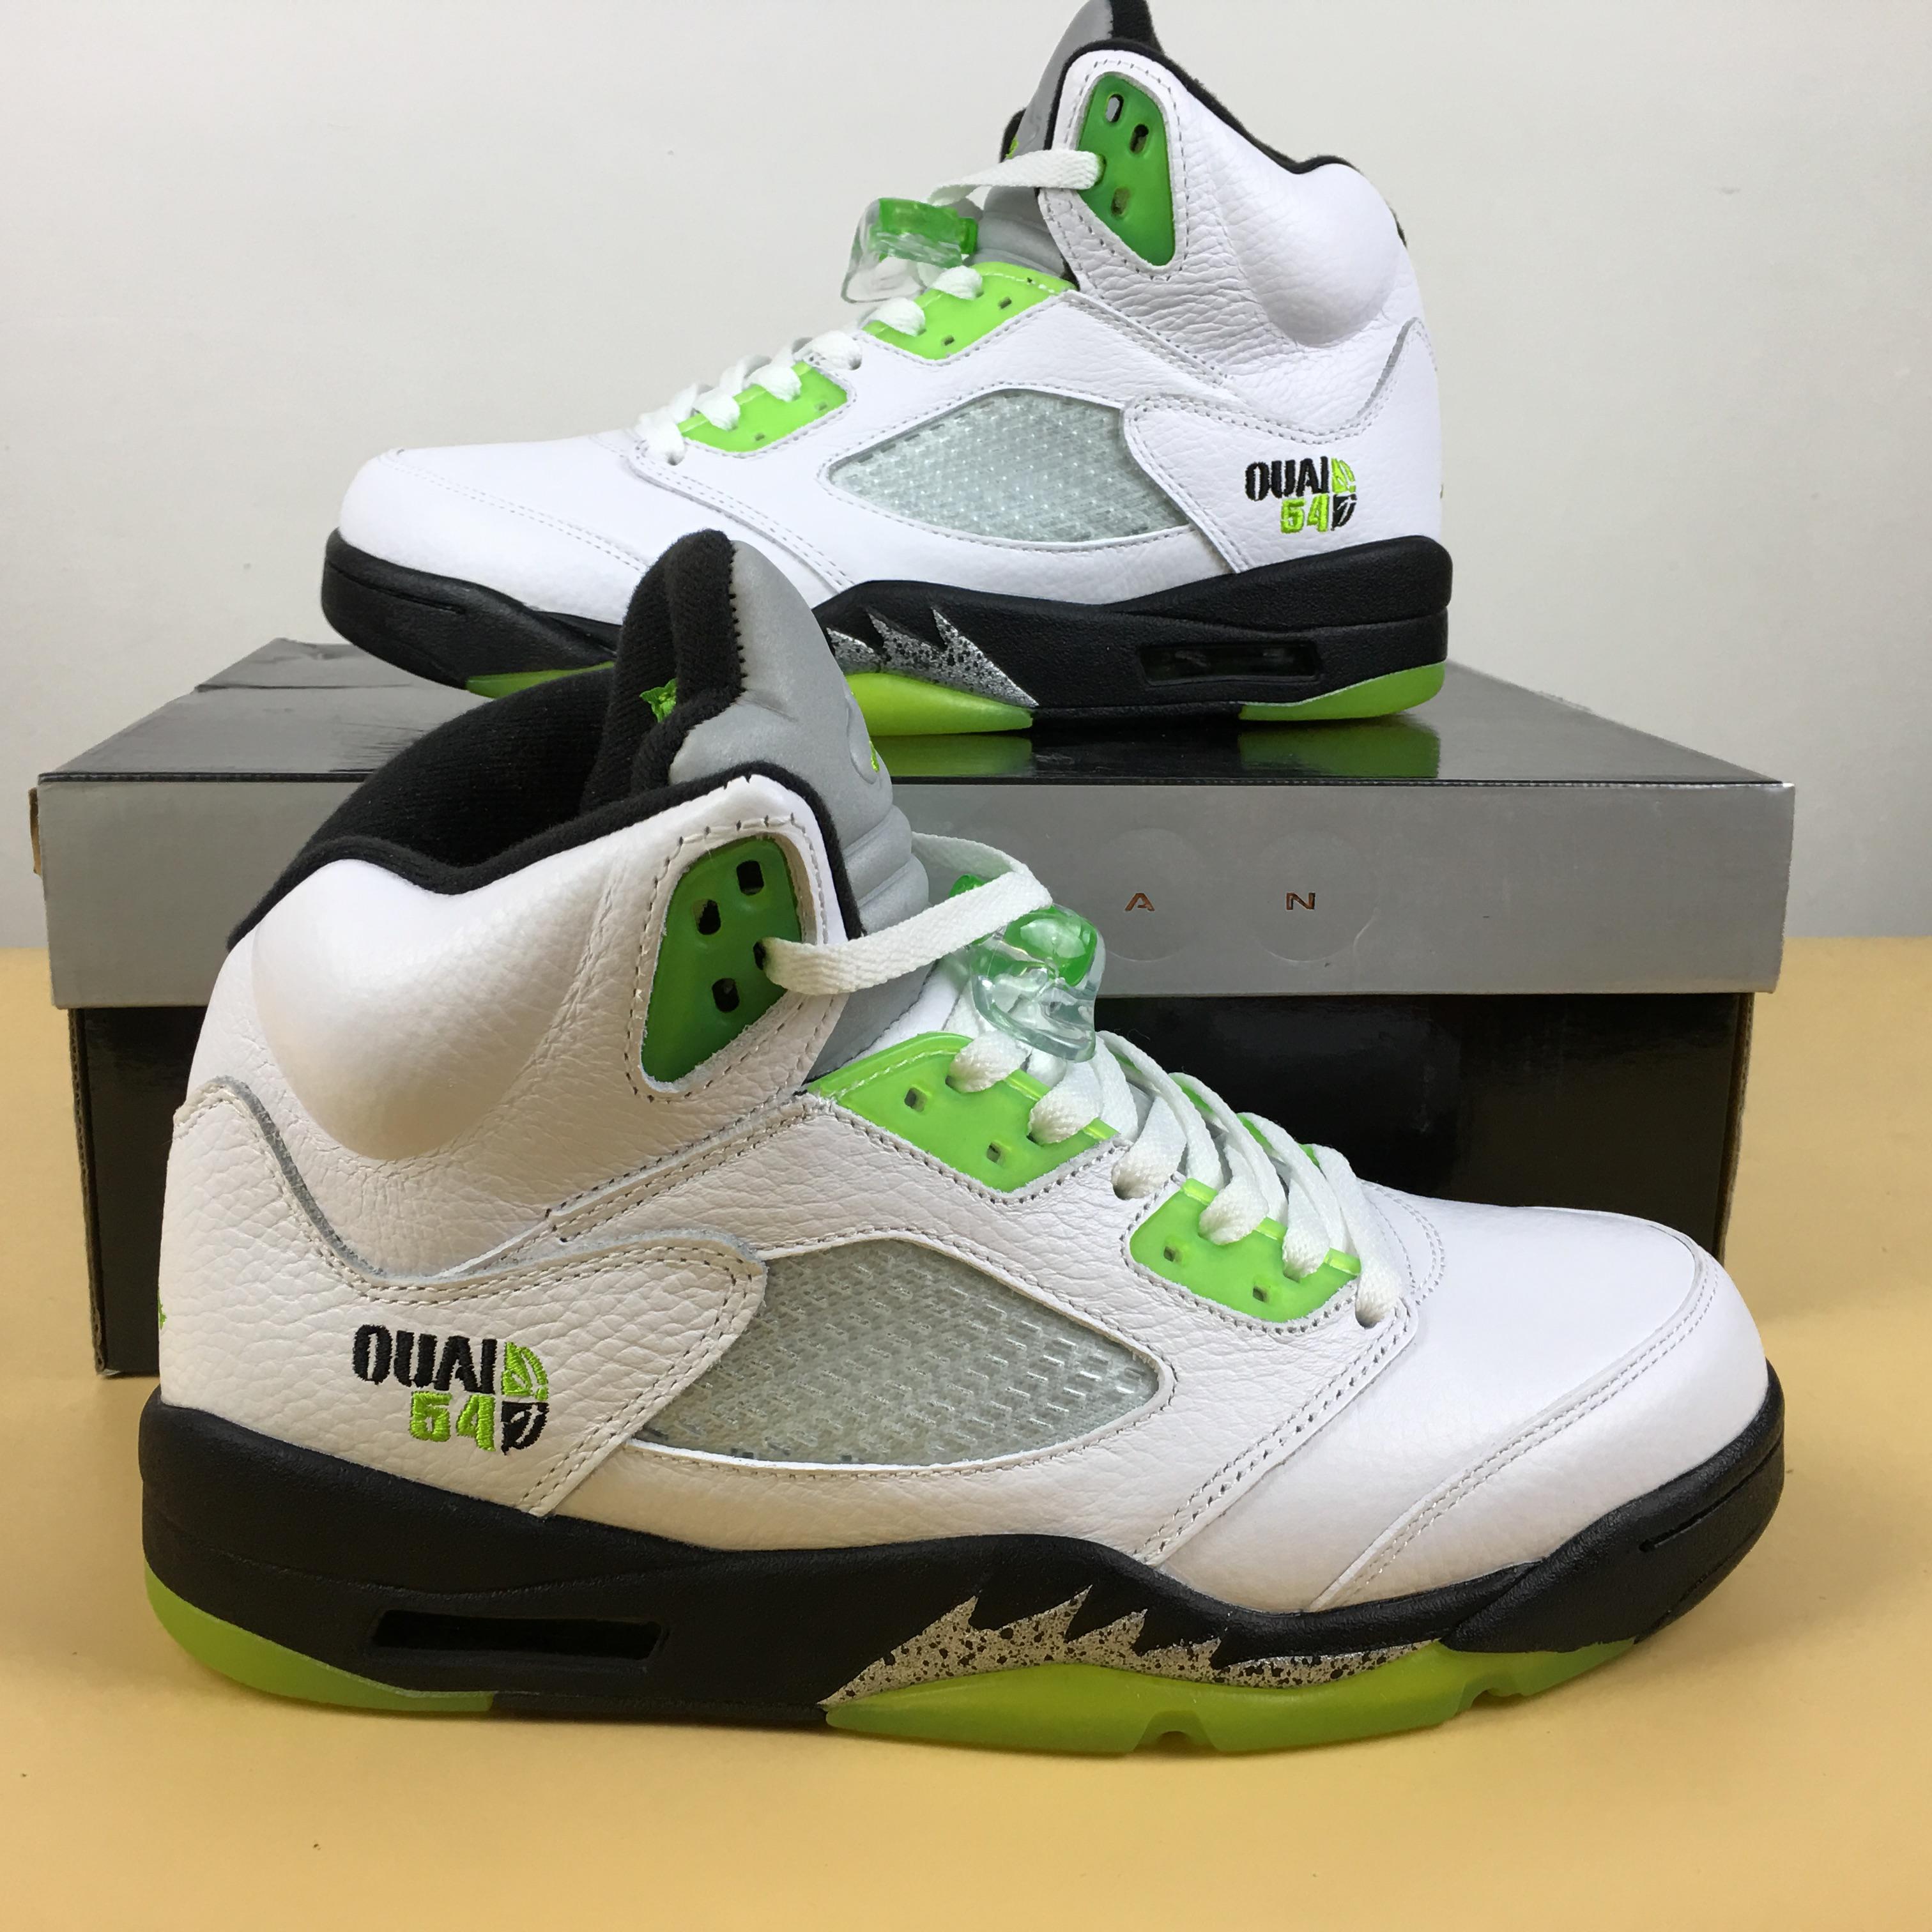 65bee6853f8 New Men Air Jordan 5 Quai54 White Green Shoes